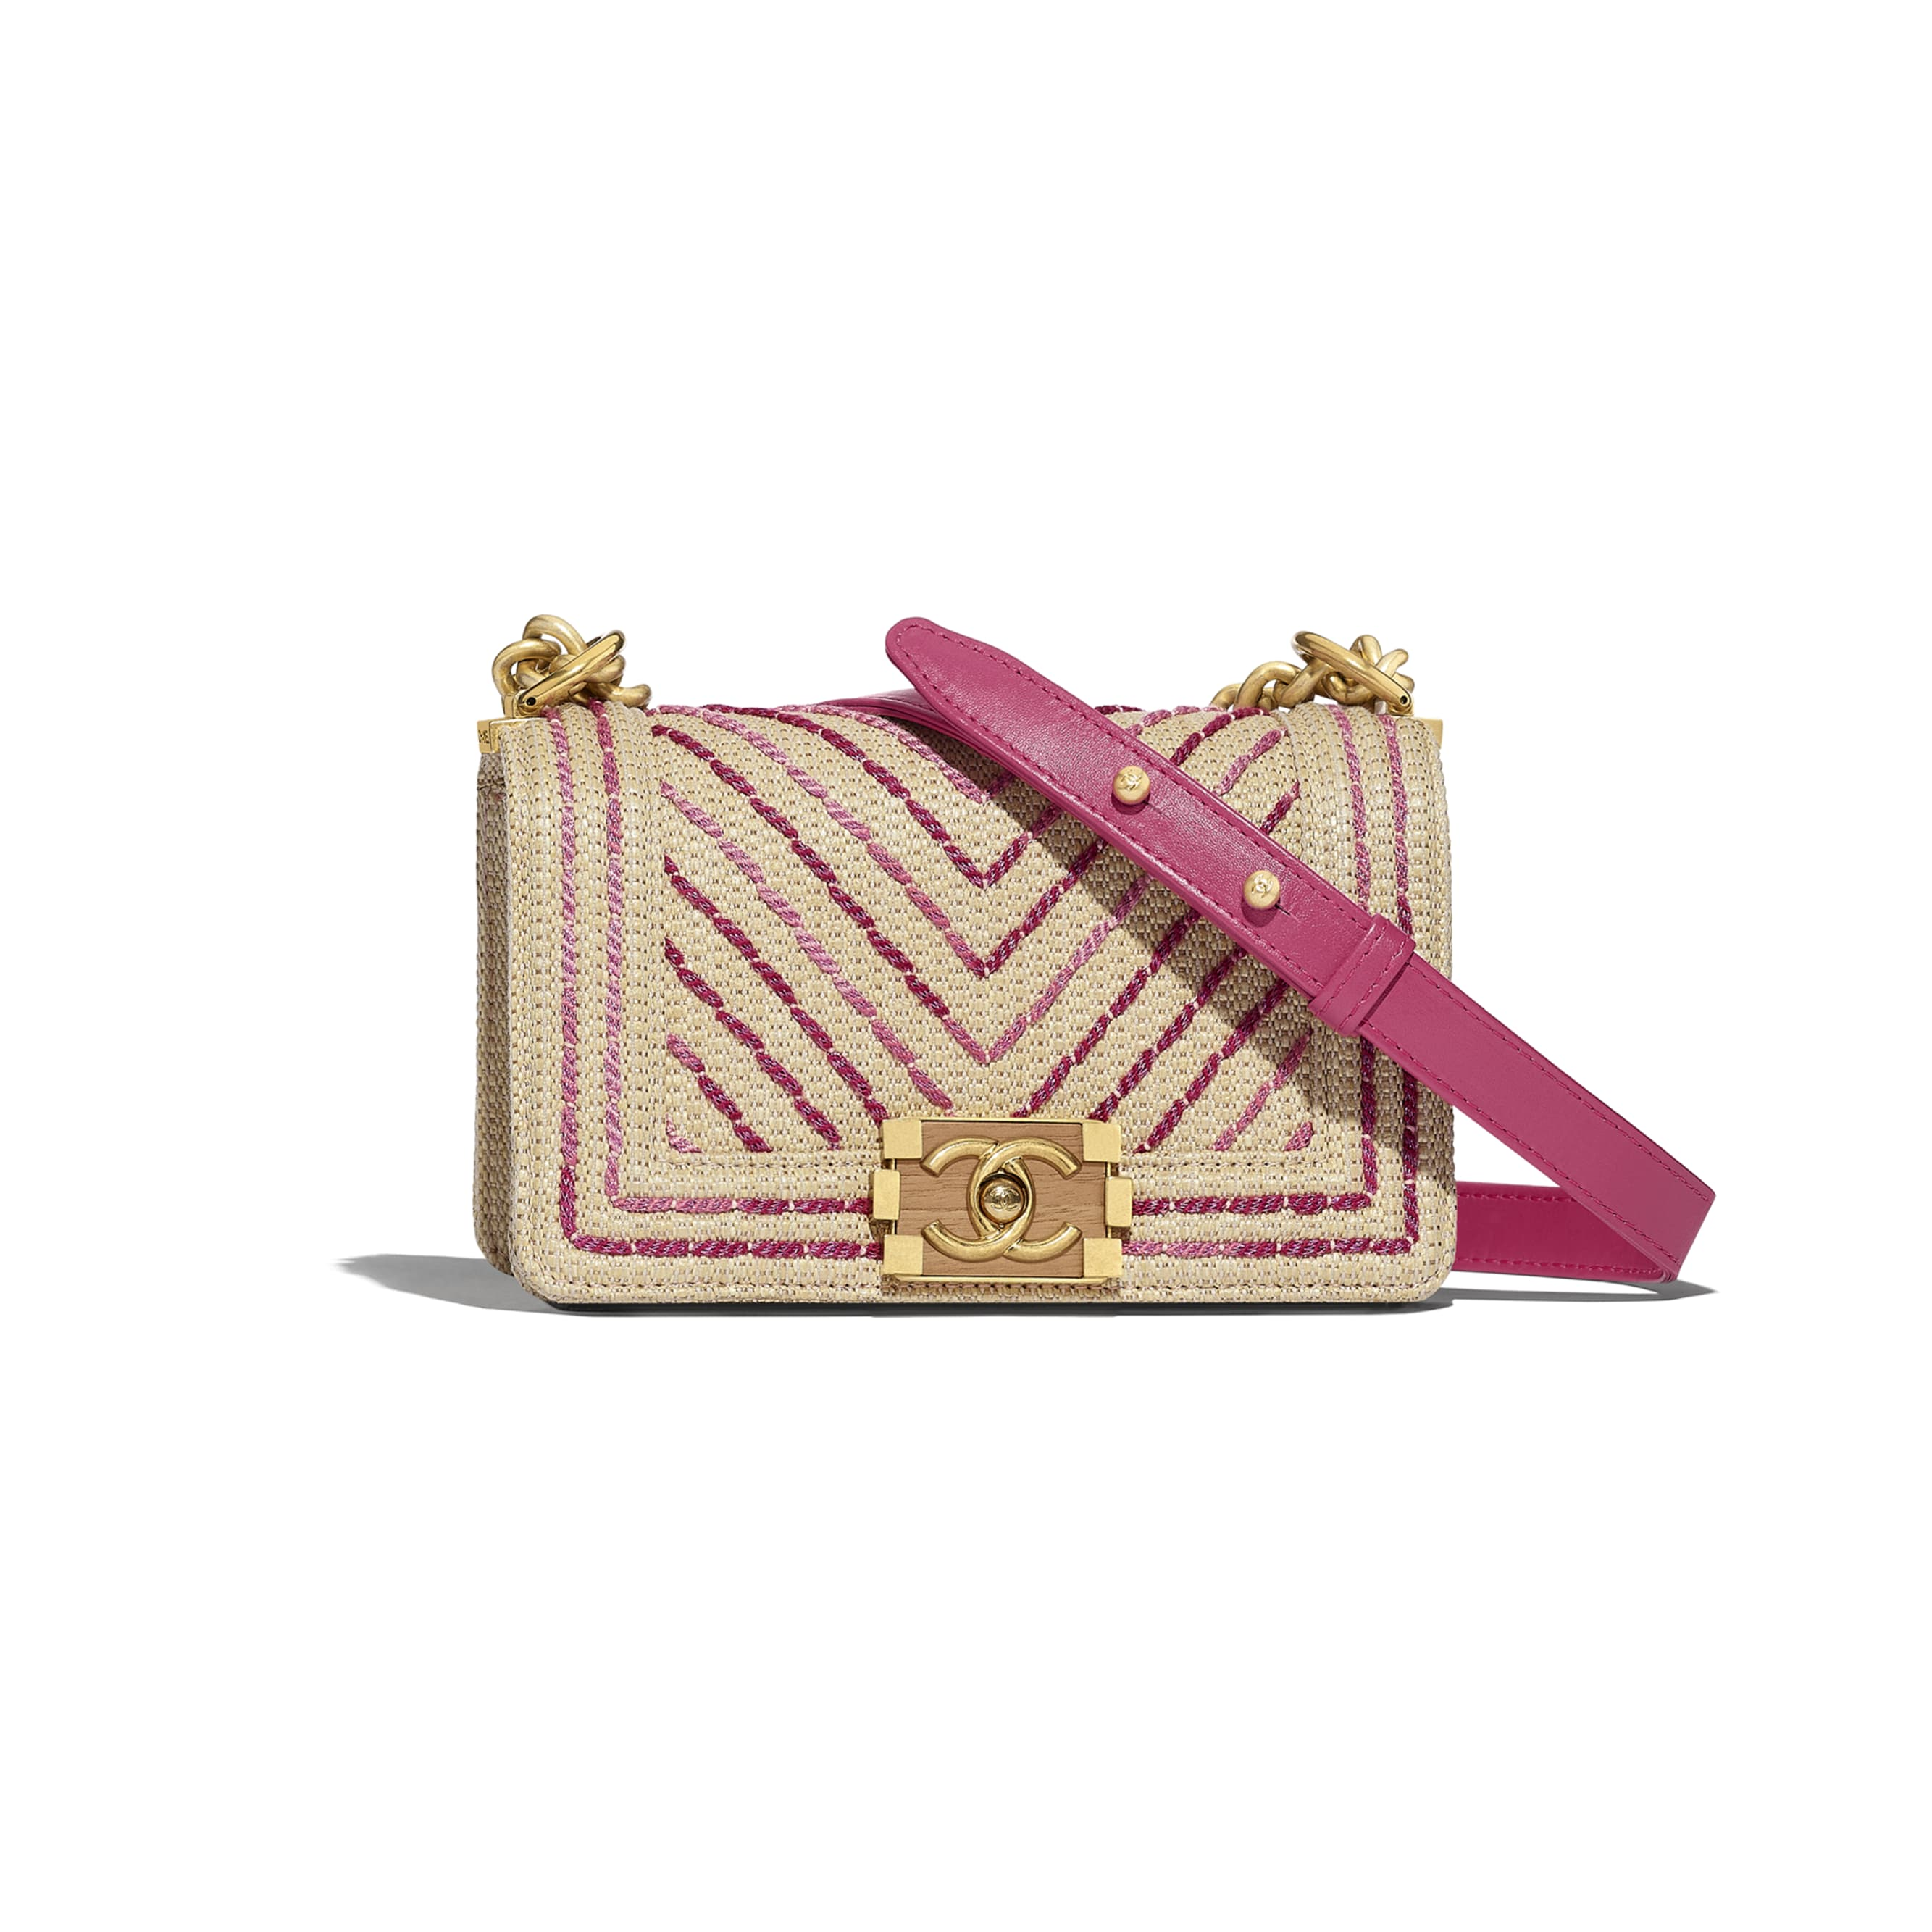 small-boy-chanel-handbag-beige-pink-cott